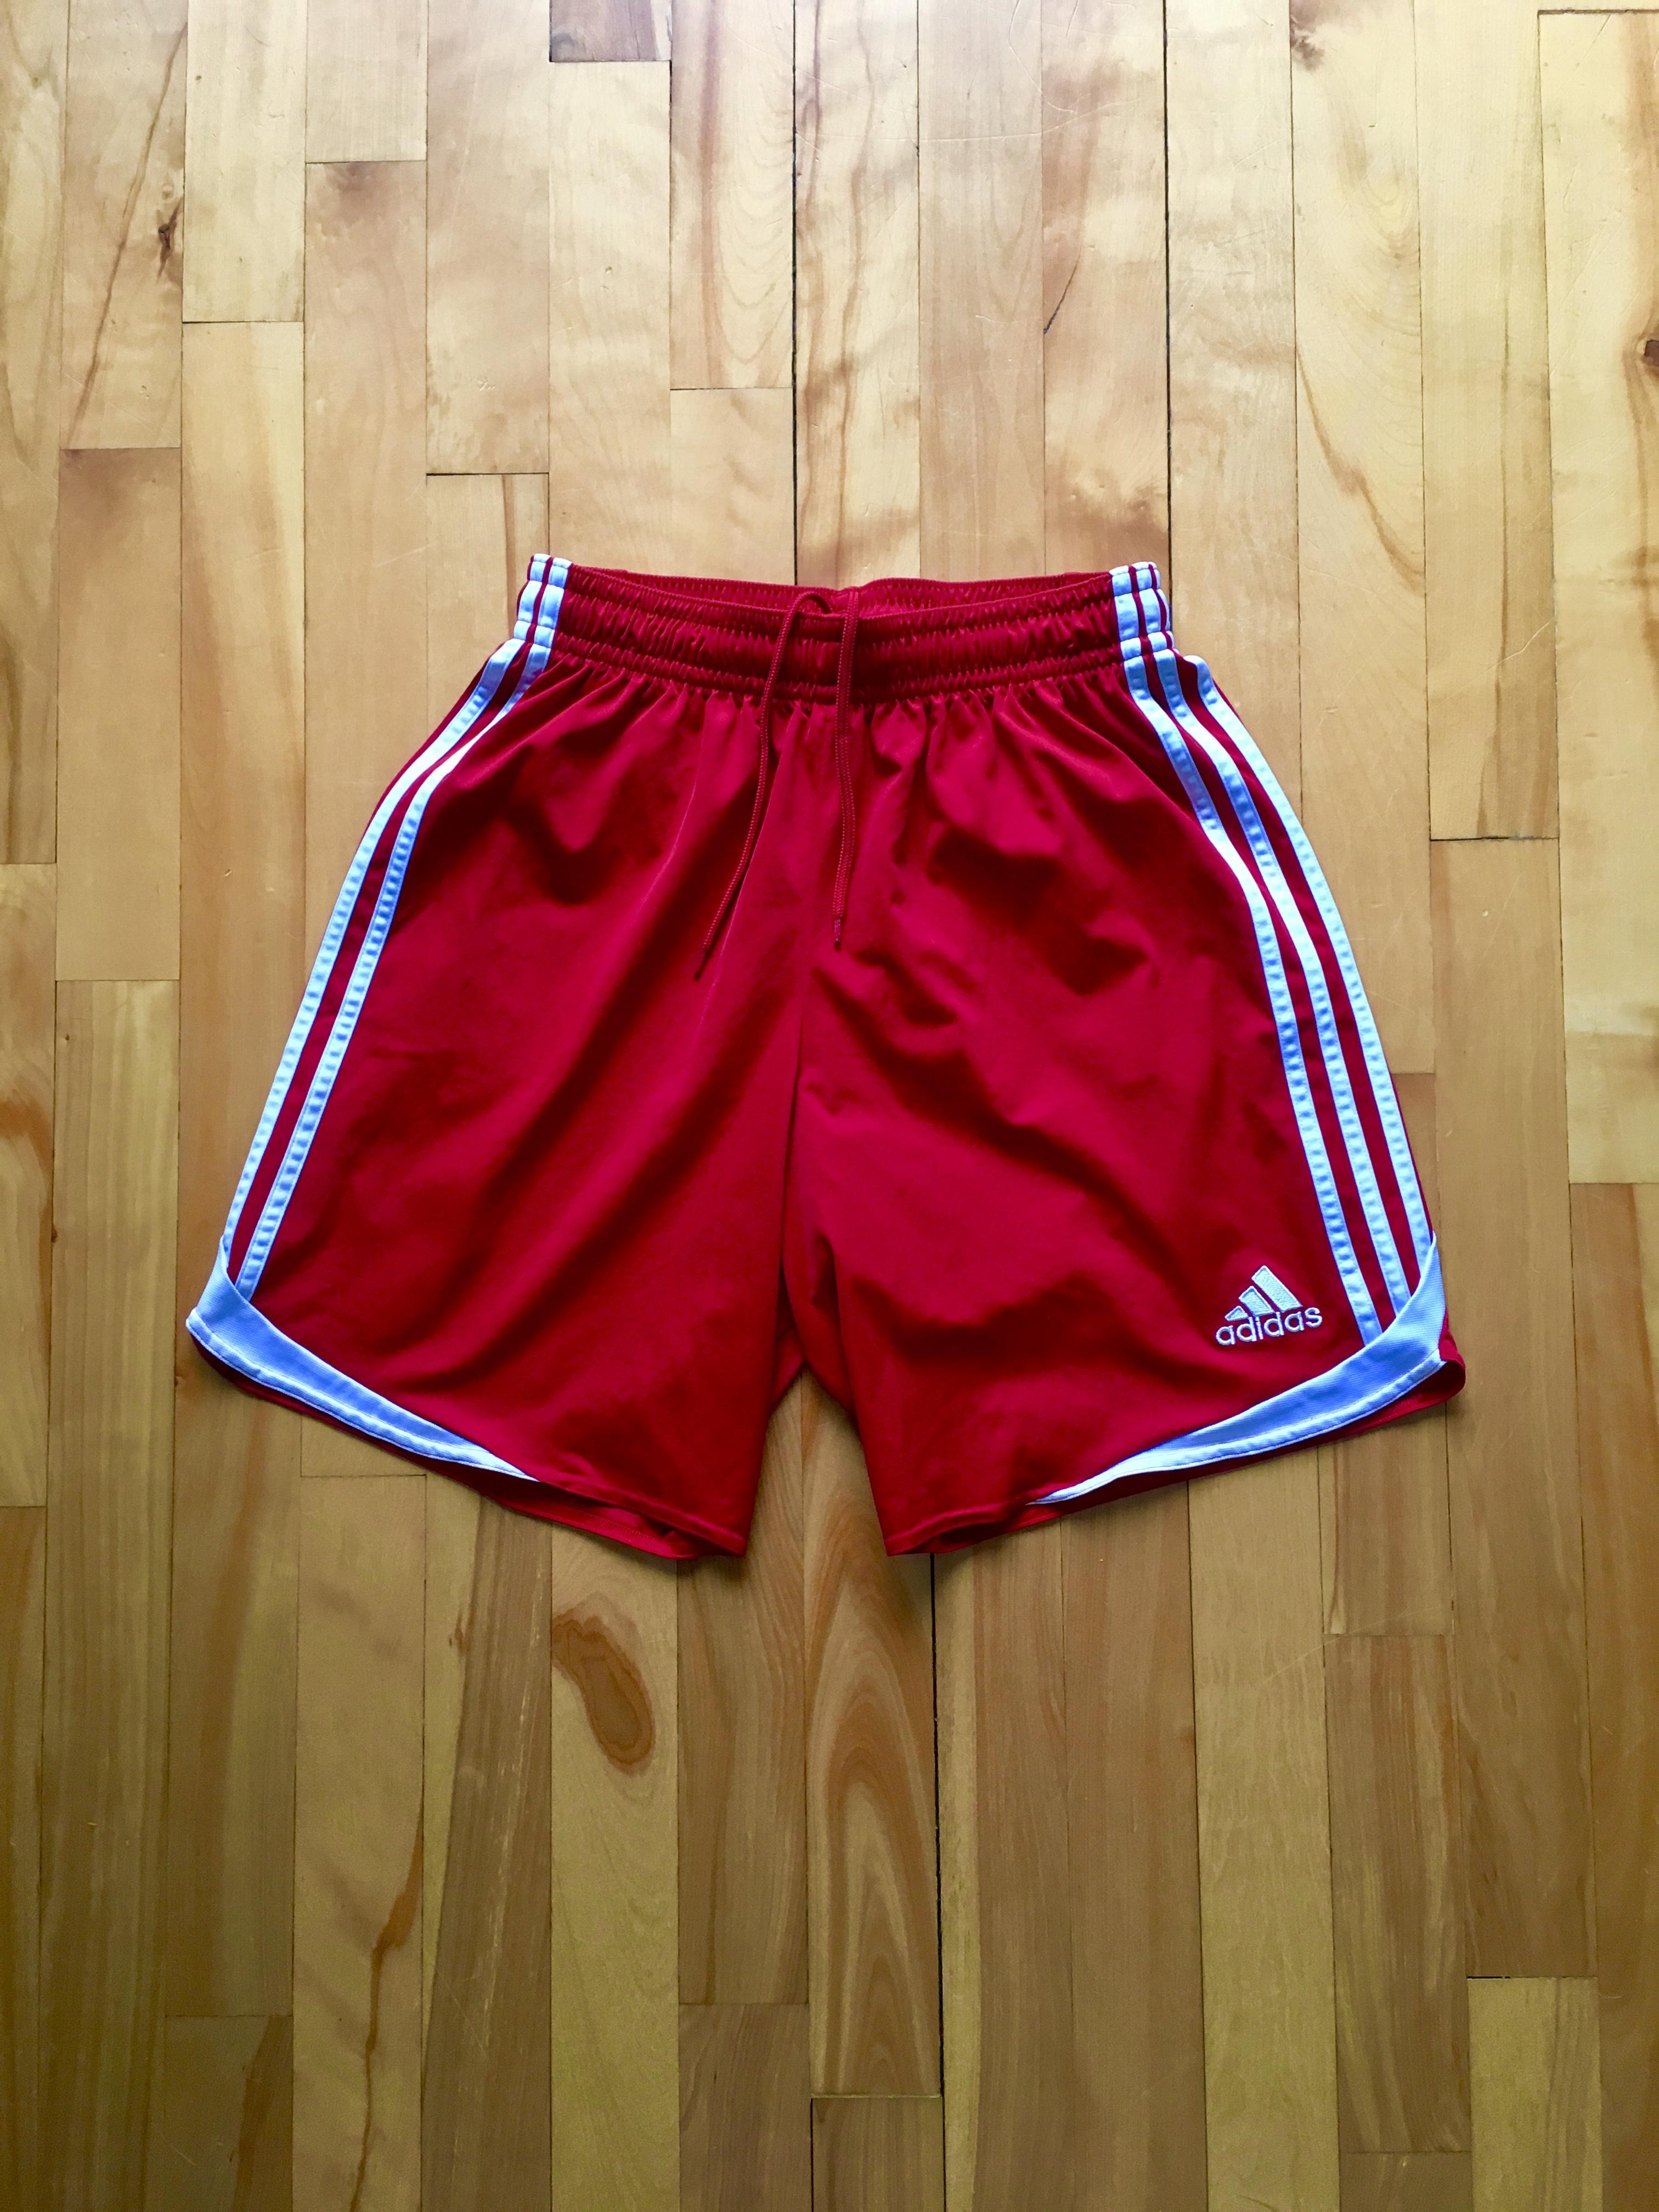 2ebf5176fa Adidas ×. Adidas ClimaCool Classic 3 Striped Red Sport Short 90s. Size: US  32 / EU 48